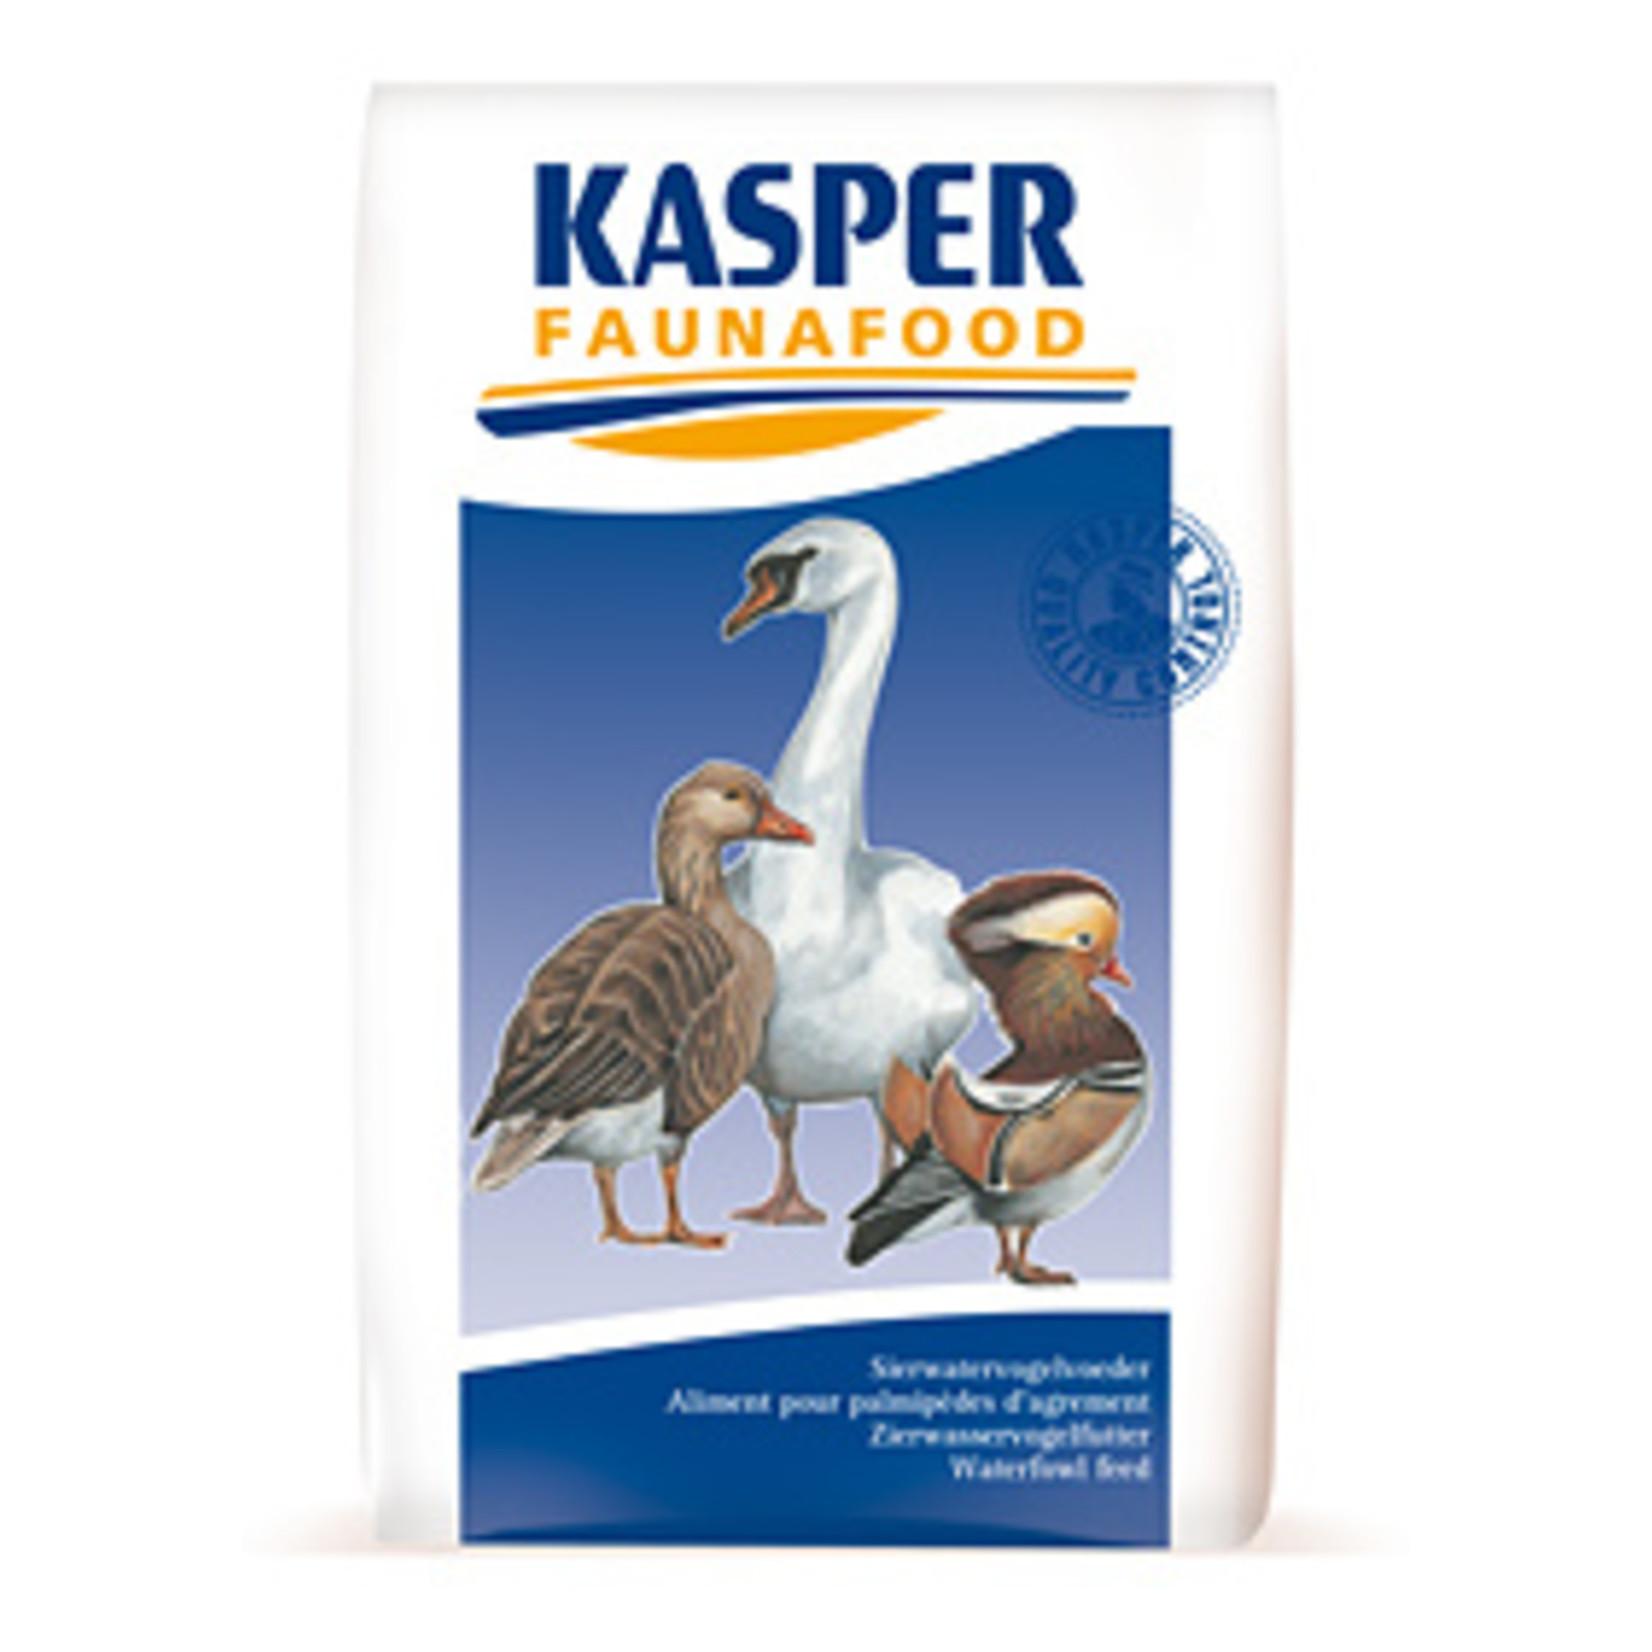 Kasper Faunaf. KFF Sierwater (Anseres) 2 - Opfokkorrel  8-18 wkn 20 KG